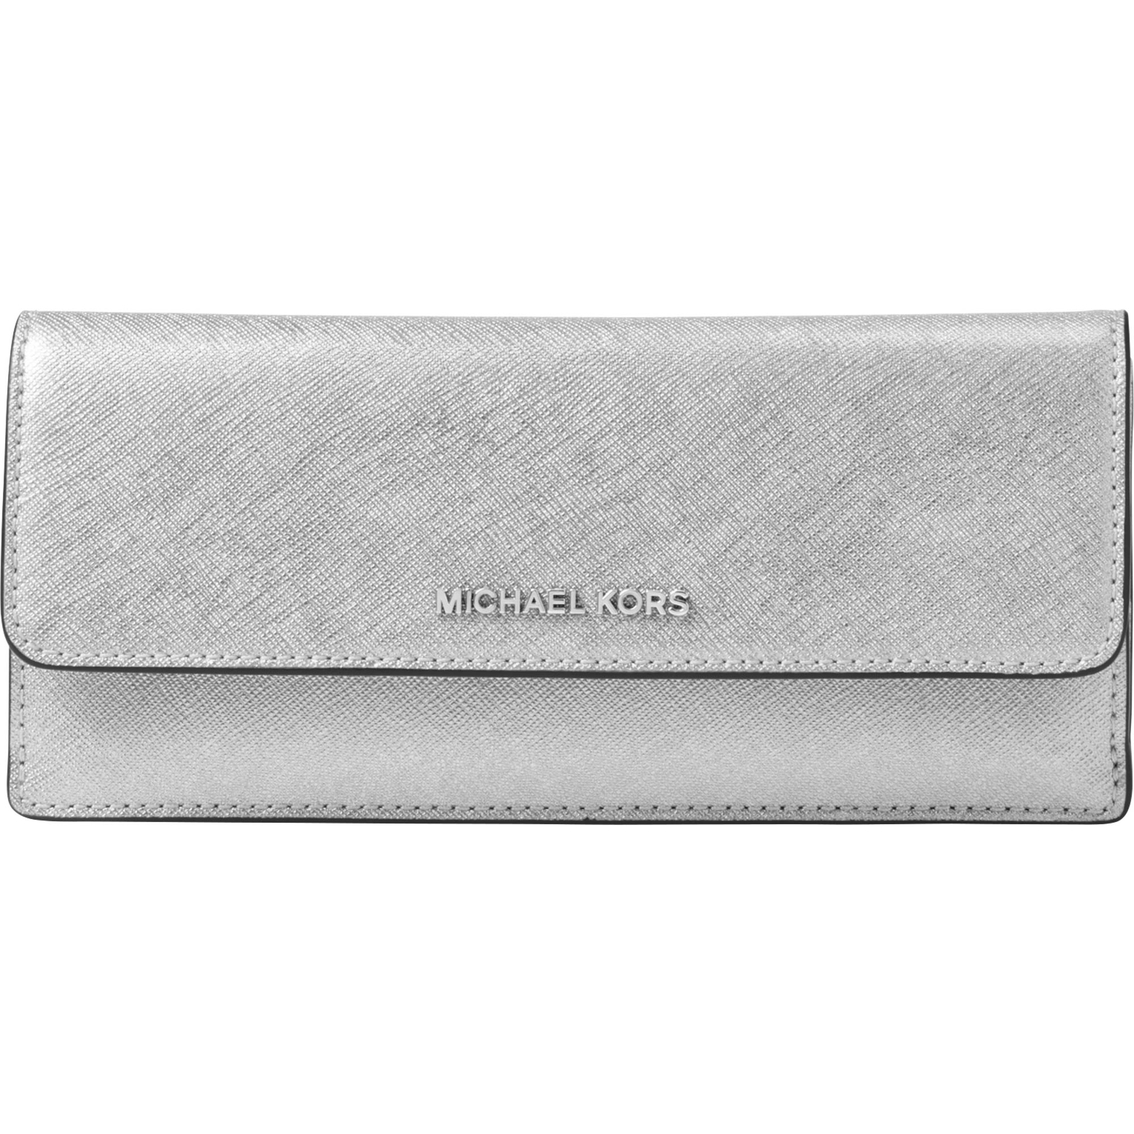 d1b263498e33 Michael Kors Money Pieces Flat Wallet In Metallic Saffiano Leather ...